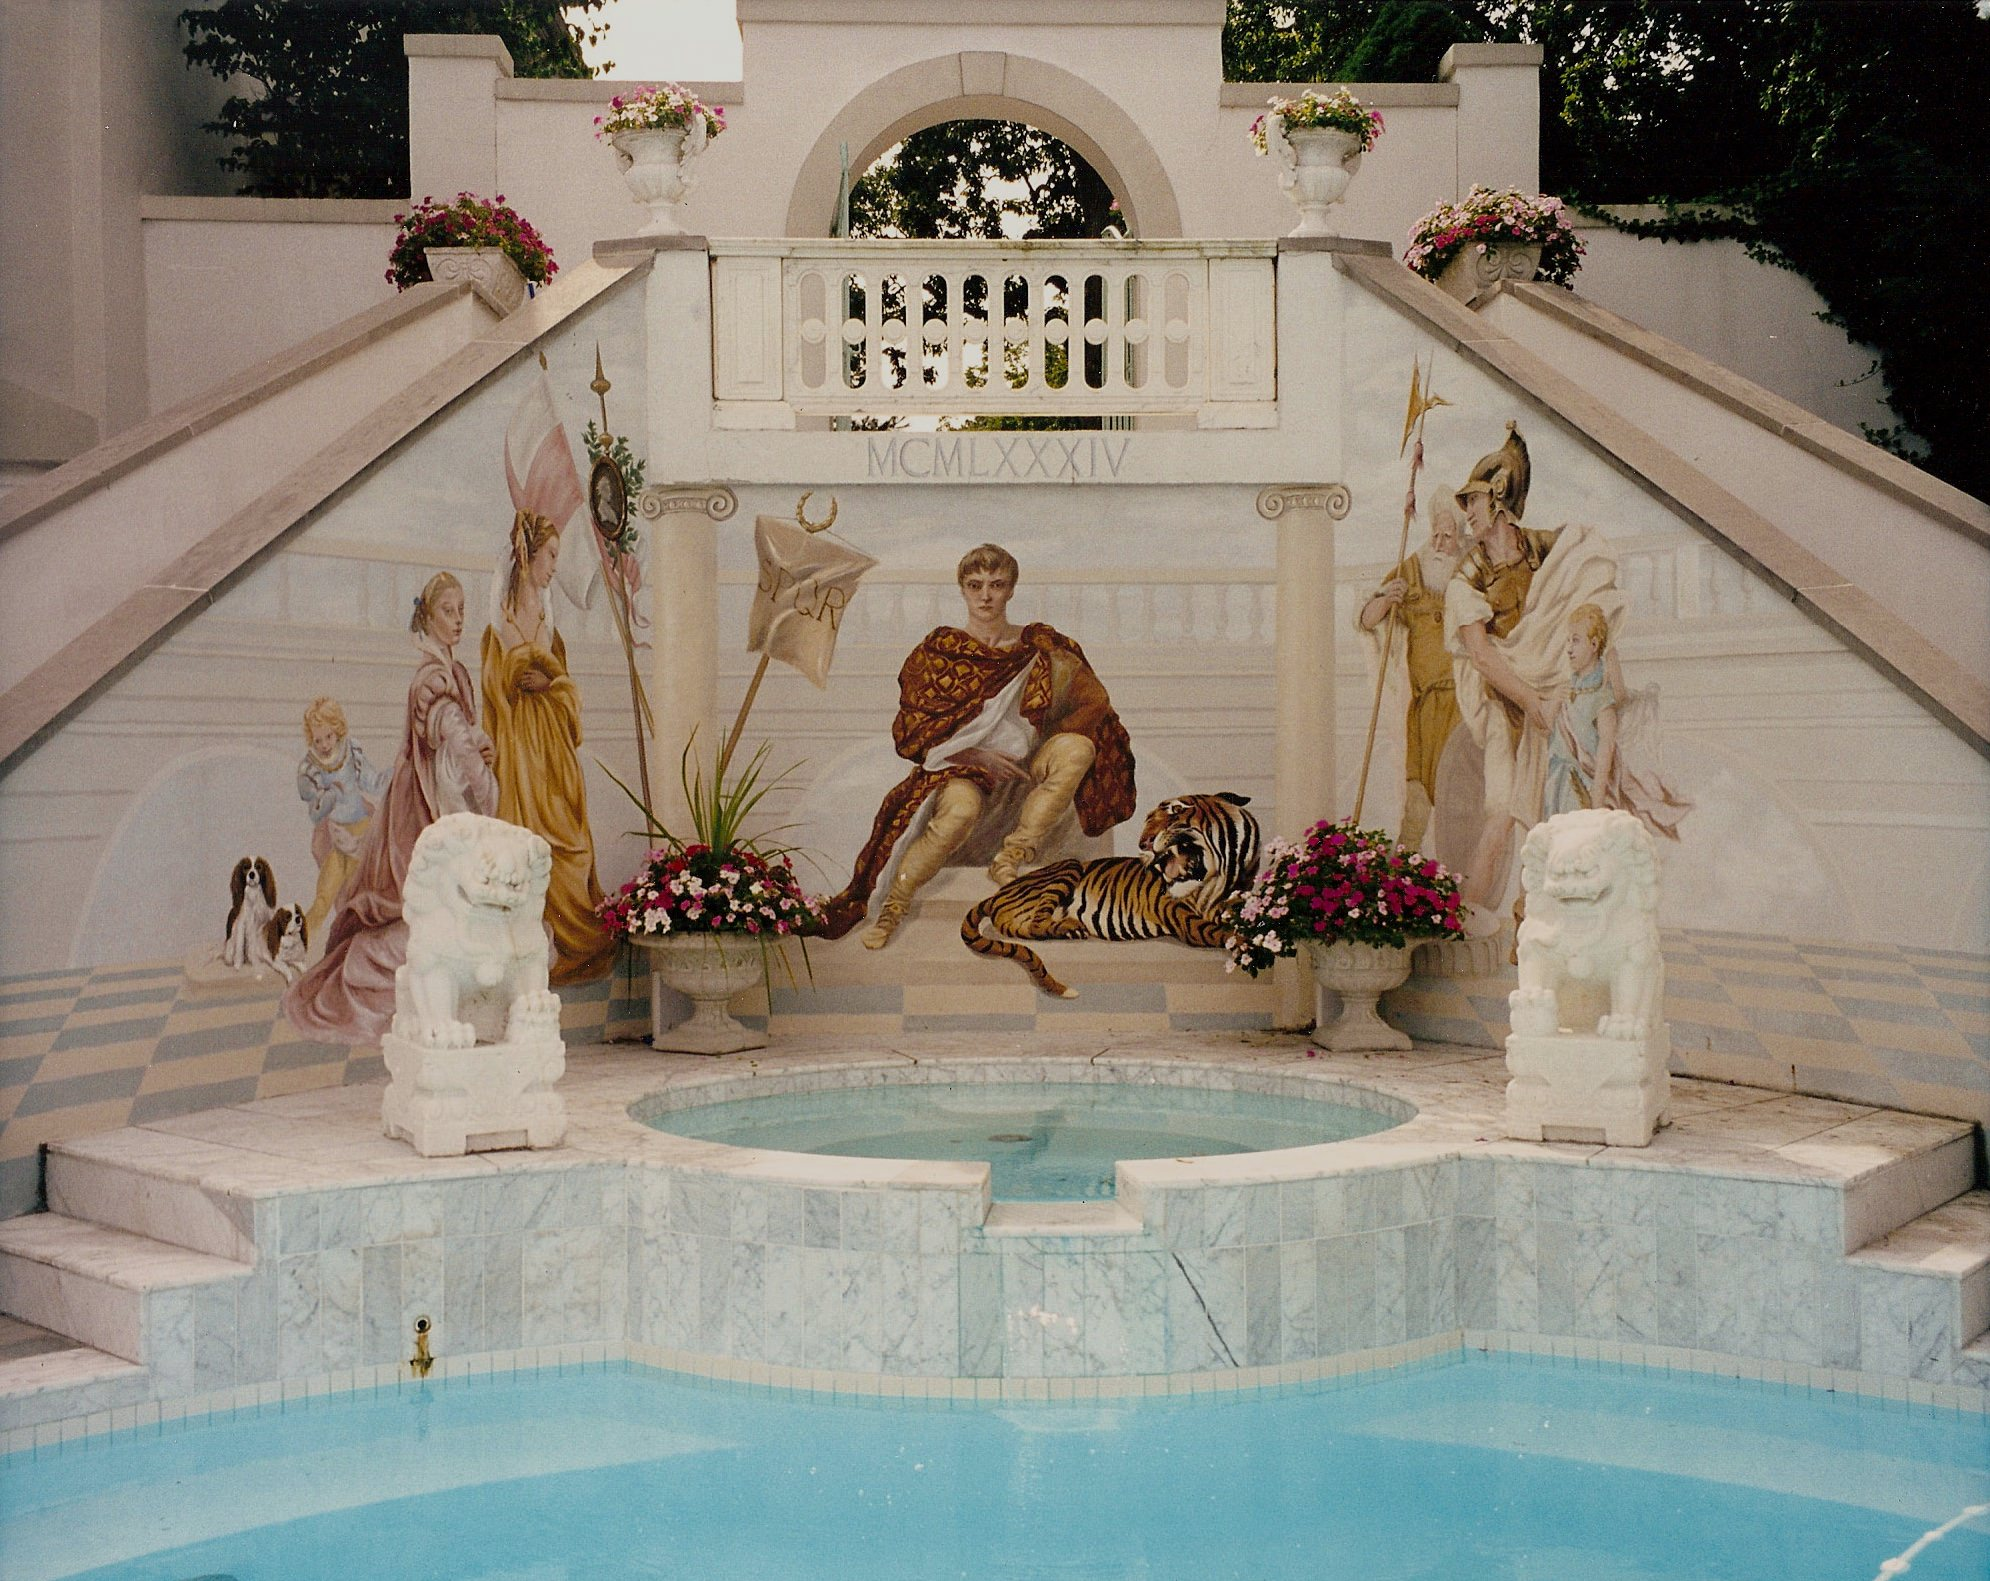 Outdoor Pool Mural Rumson, NJ